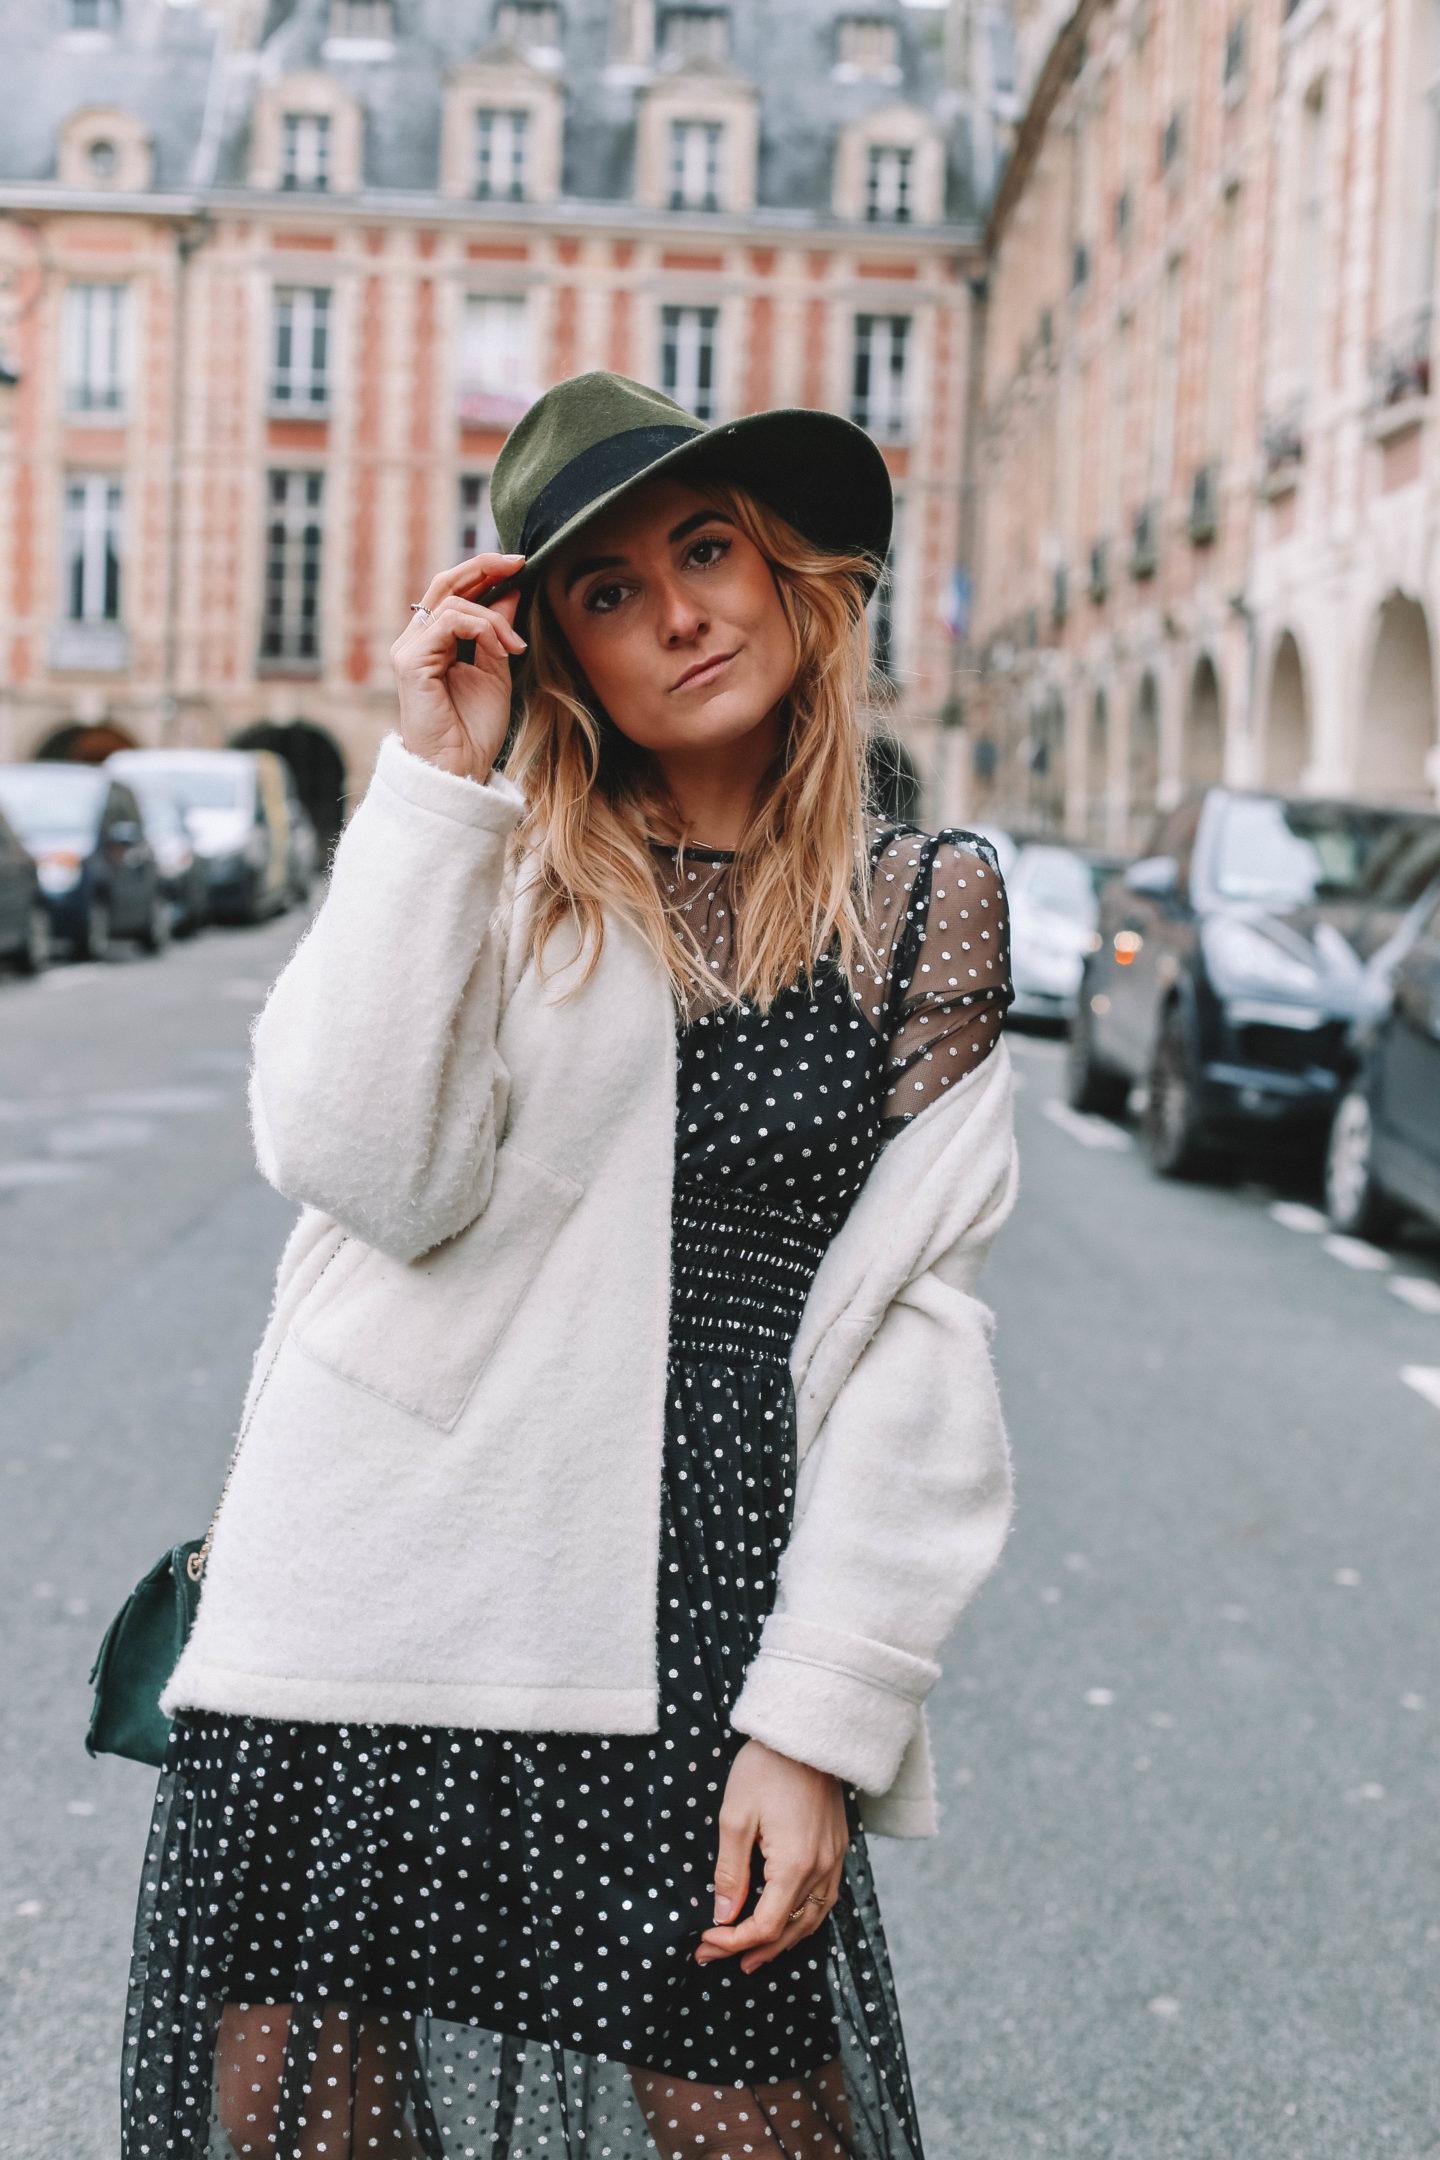 Robe noire à pois - Blondie Baby blog mode et voyages